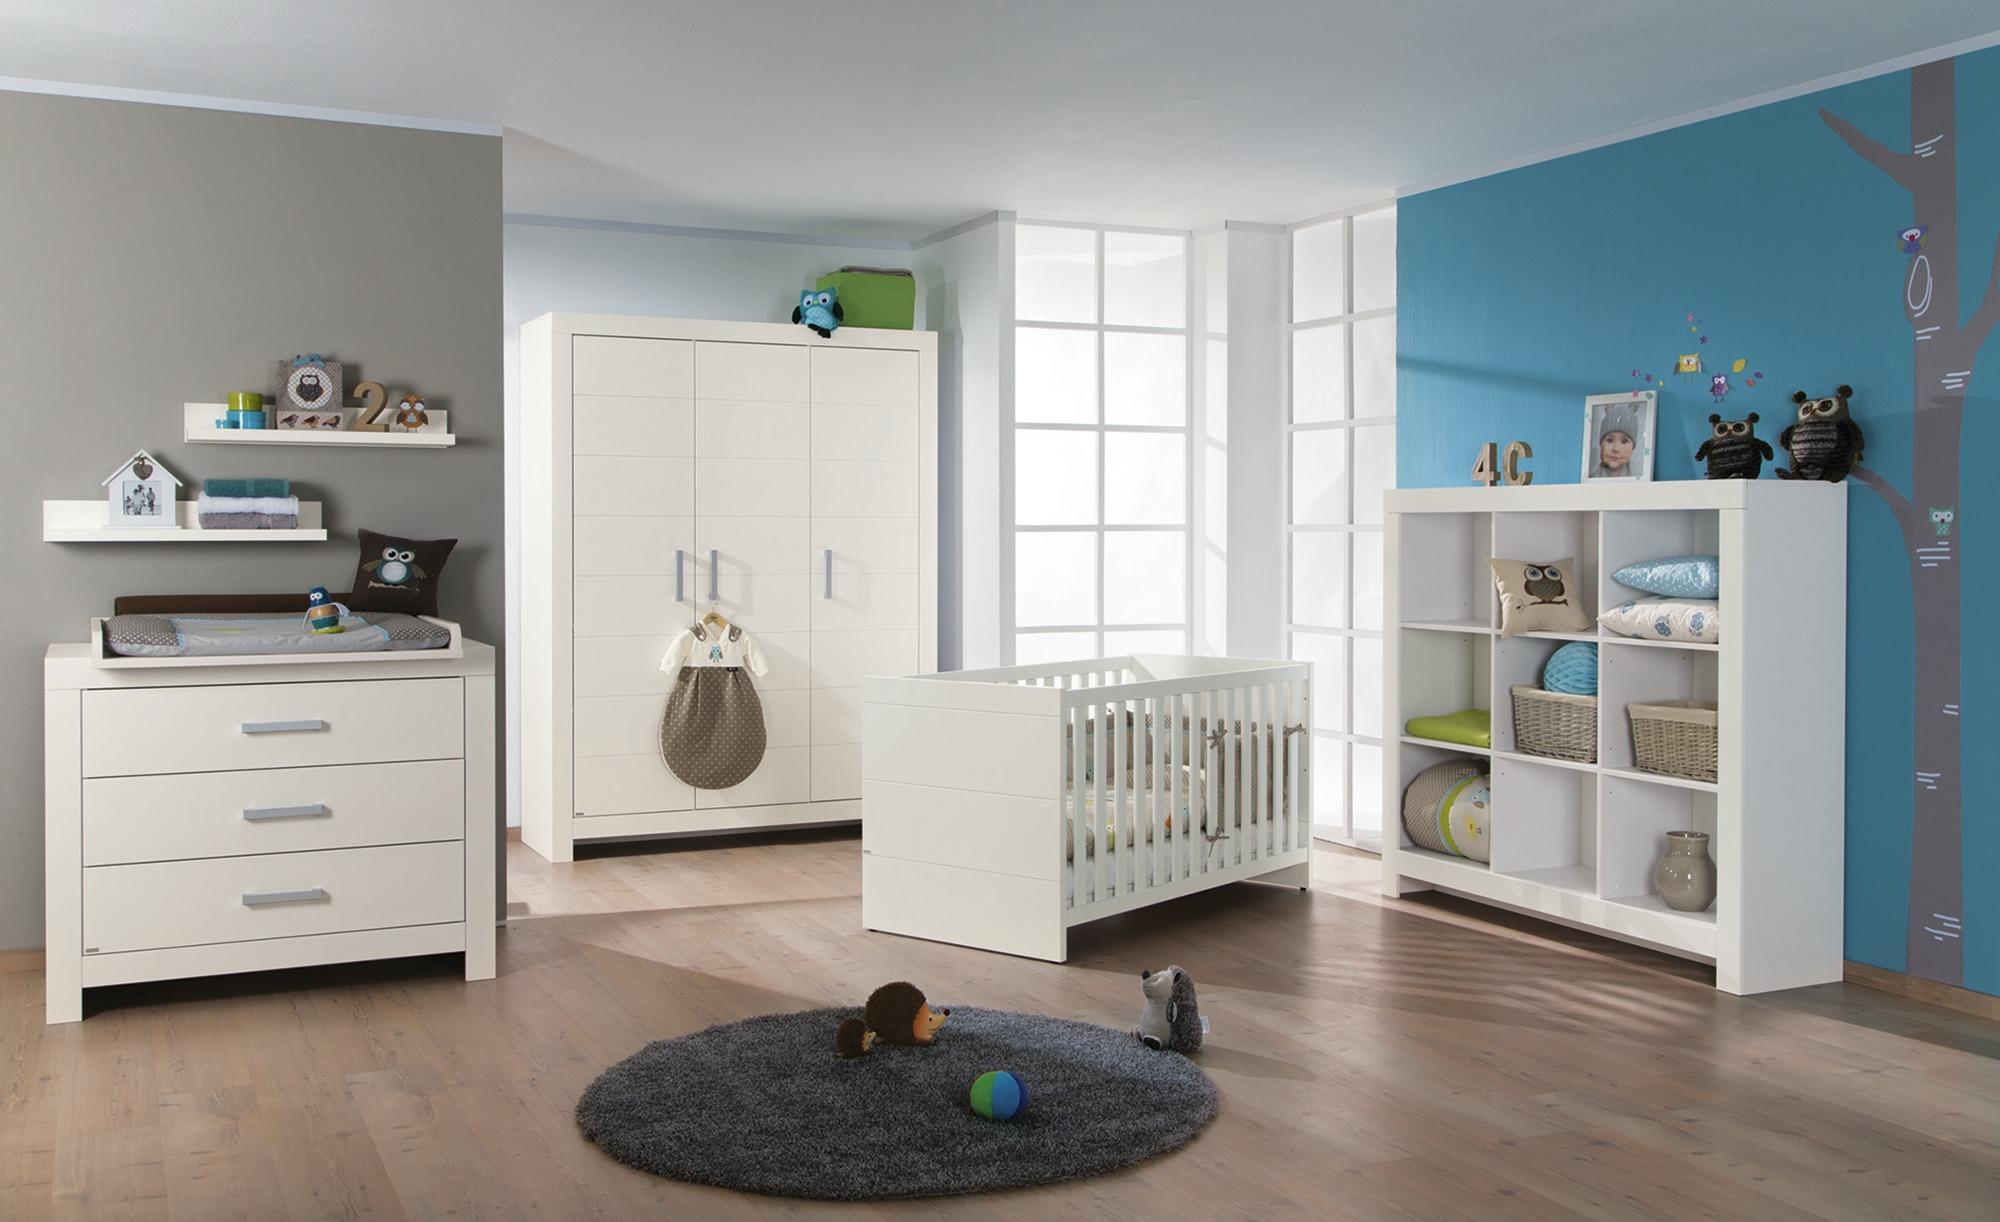 Babymobel Paidi Gunstig Kaufen Kinderbett Fiona Babyzimmer Remo ...